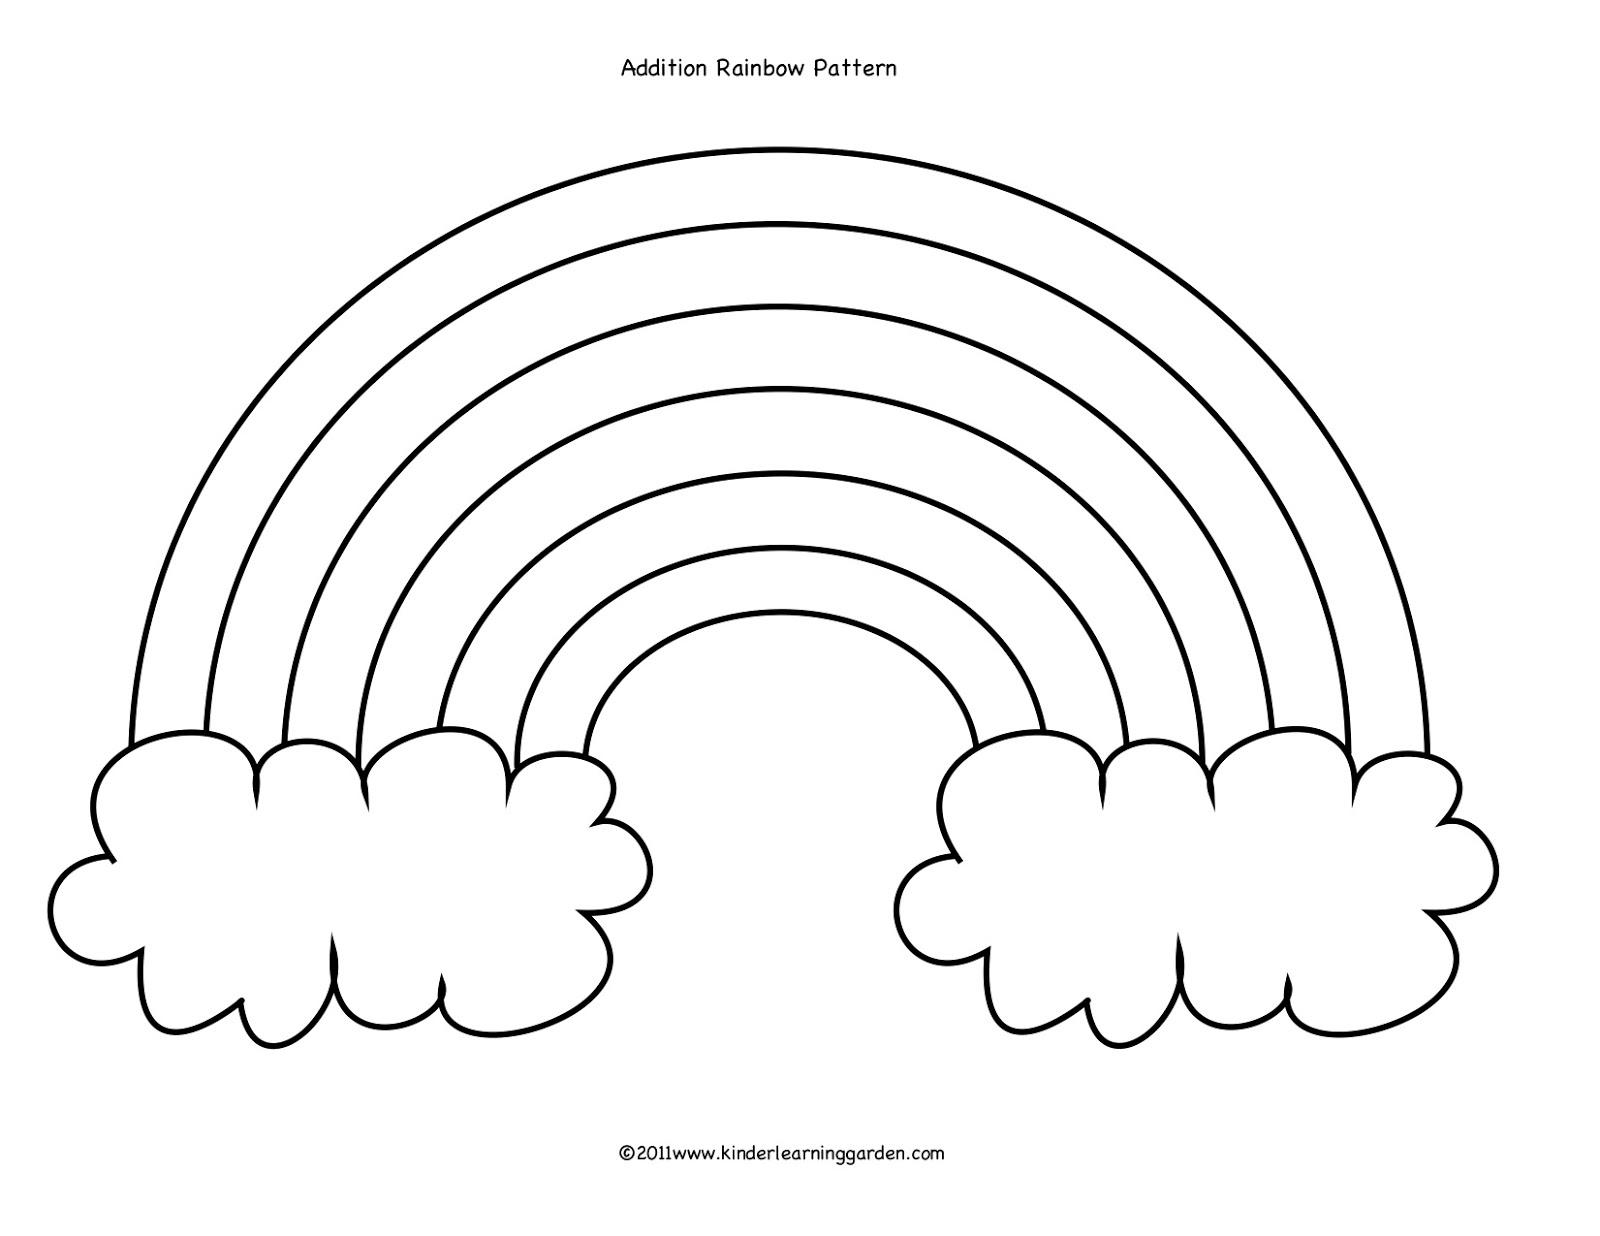 Kinder Learning Garden Rainbow Cloud Addition